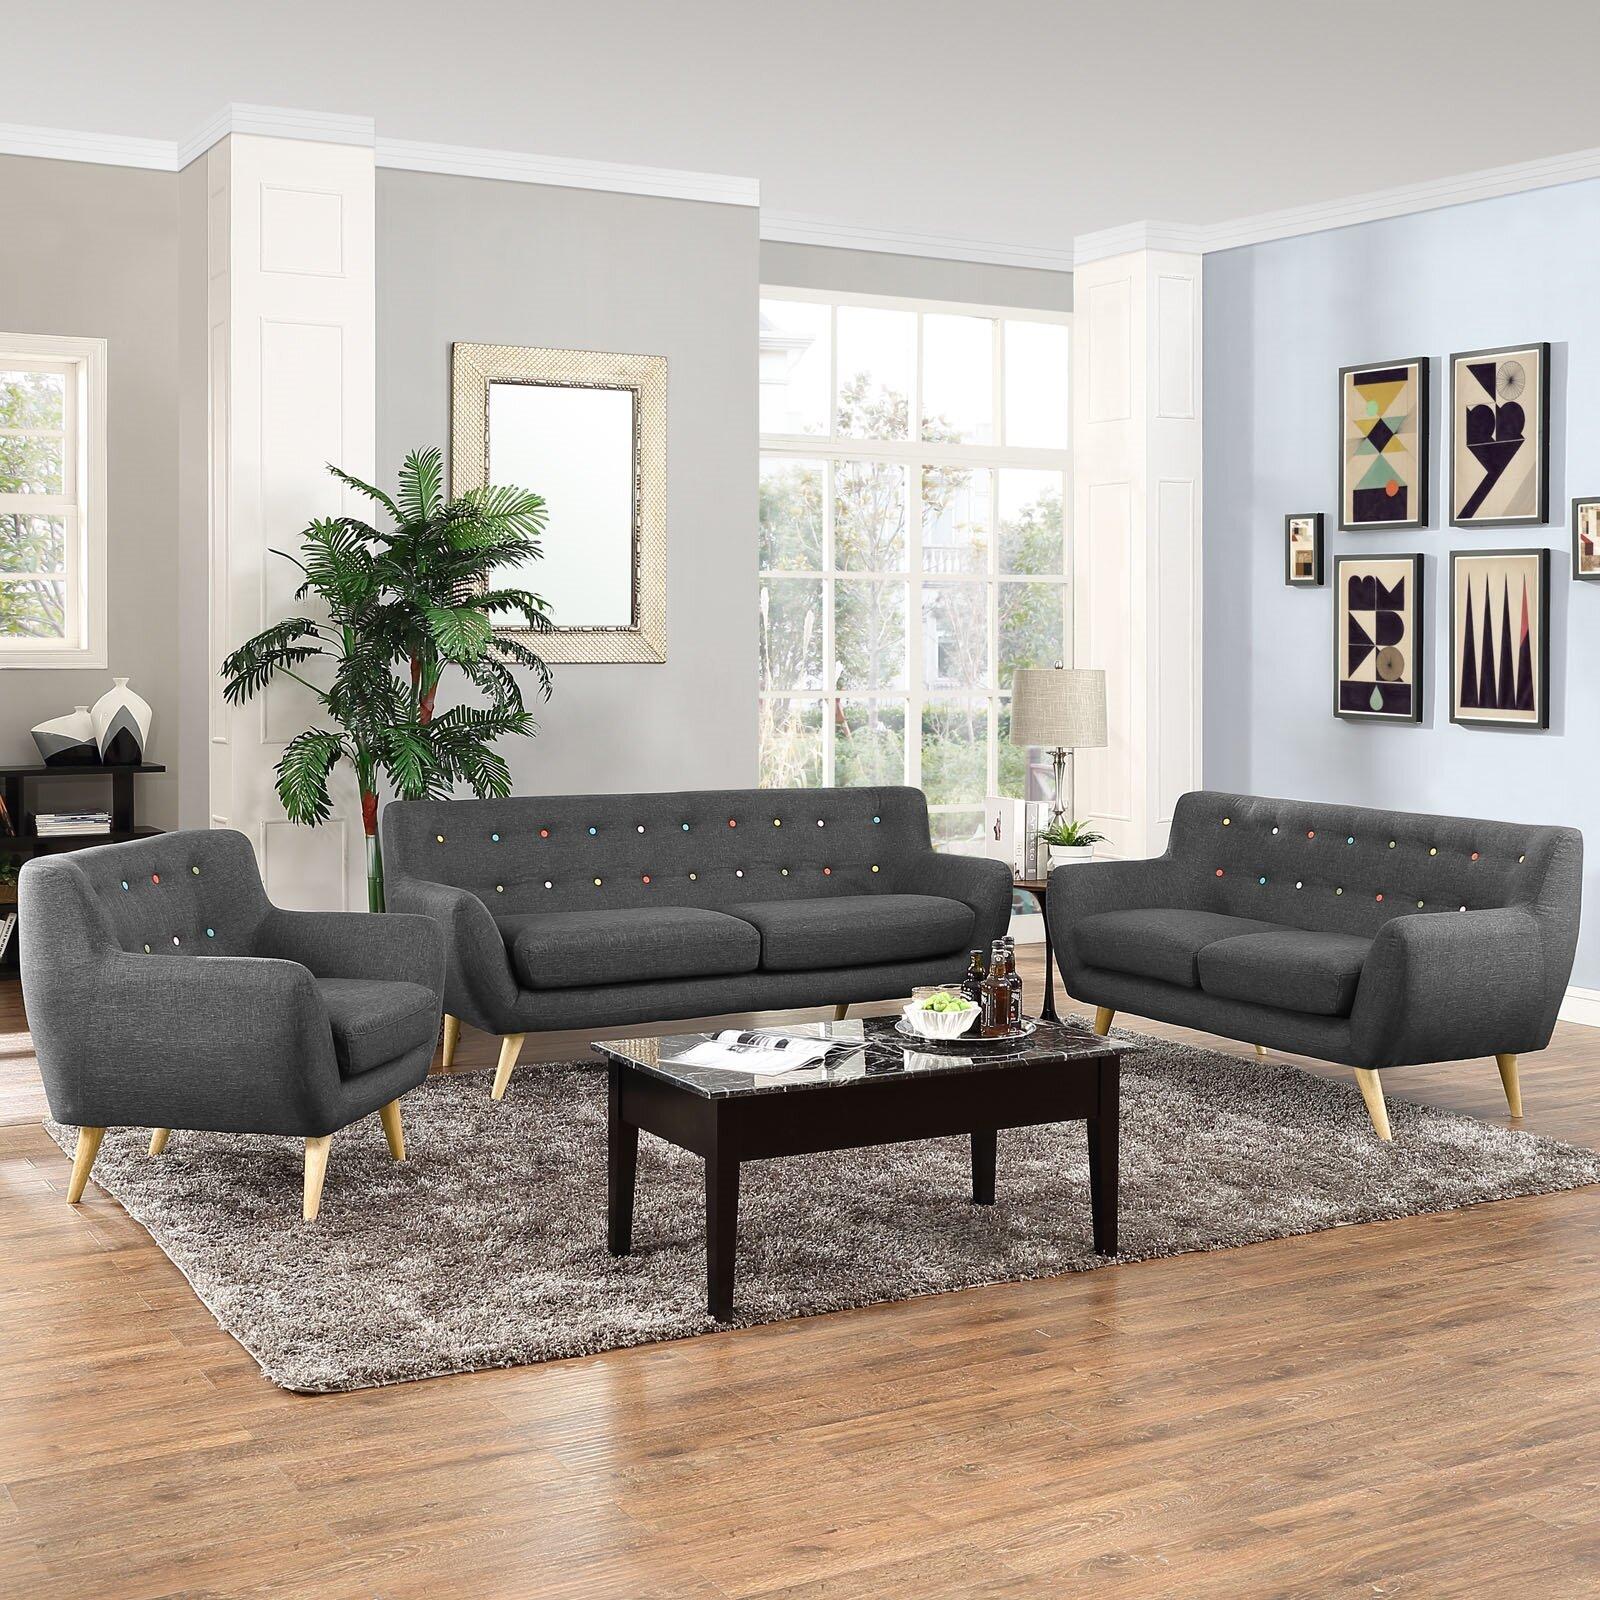 Stevie 3 Piece Living Room Set